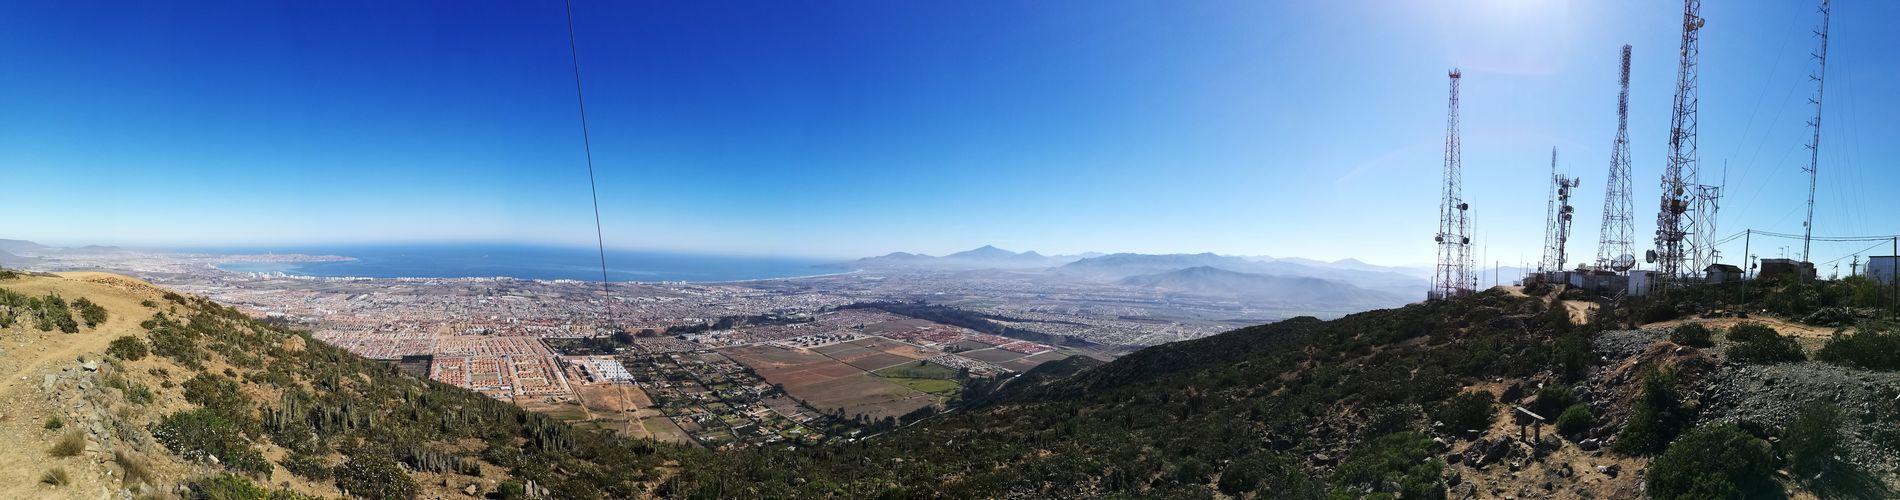 Cerro grande, la serena